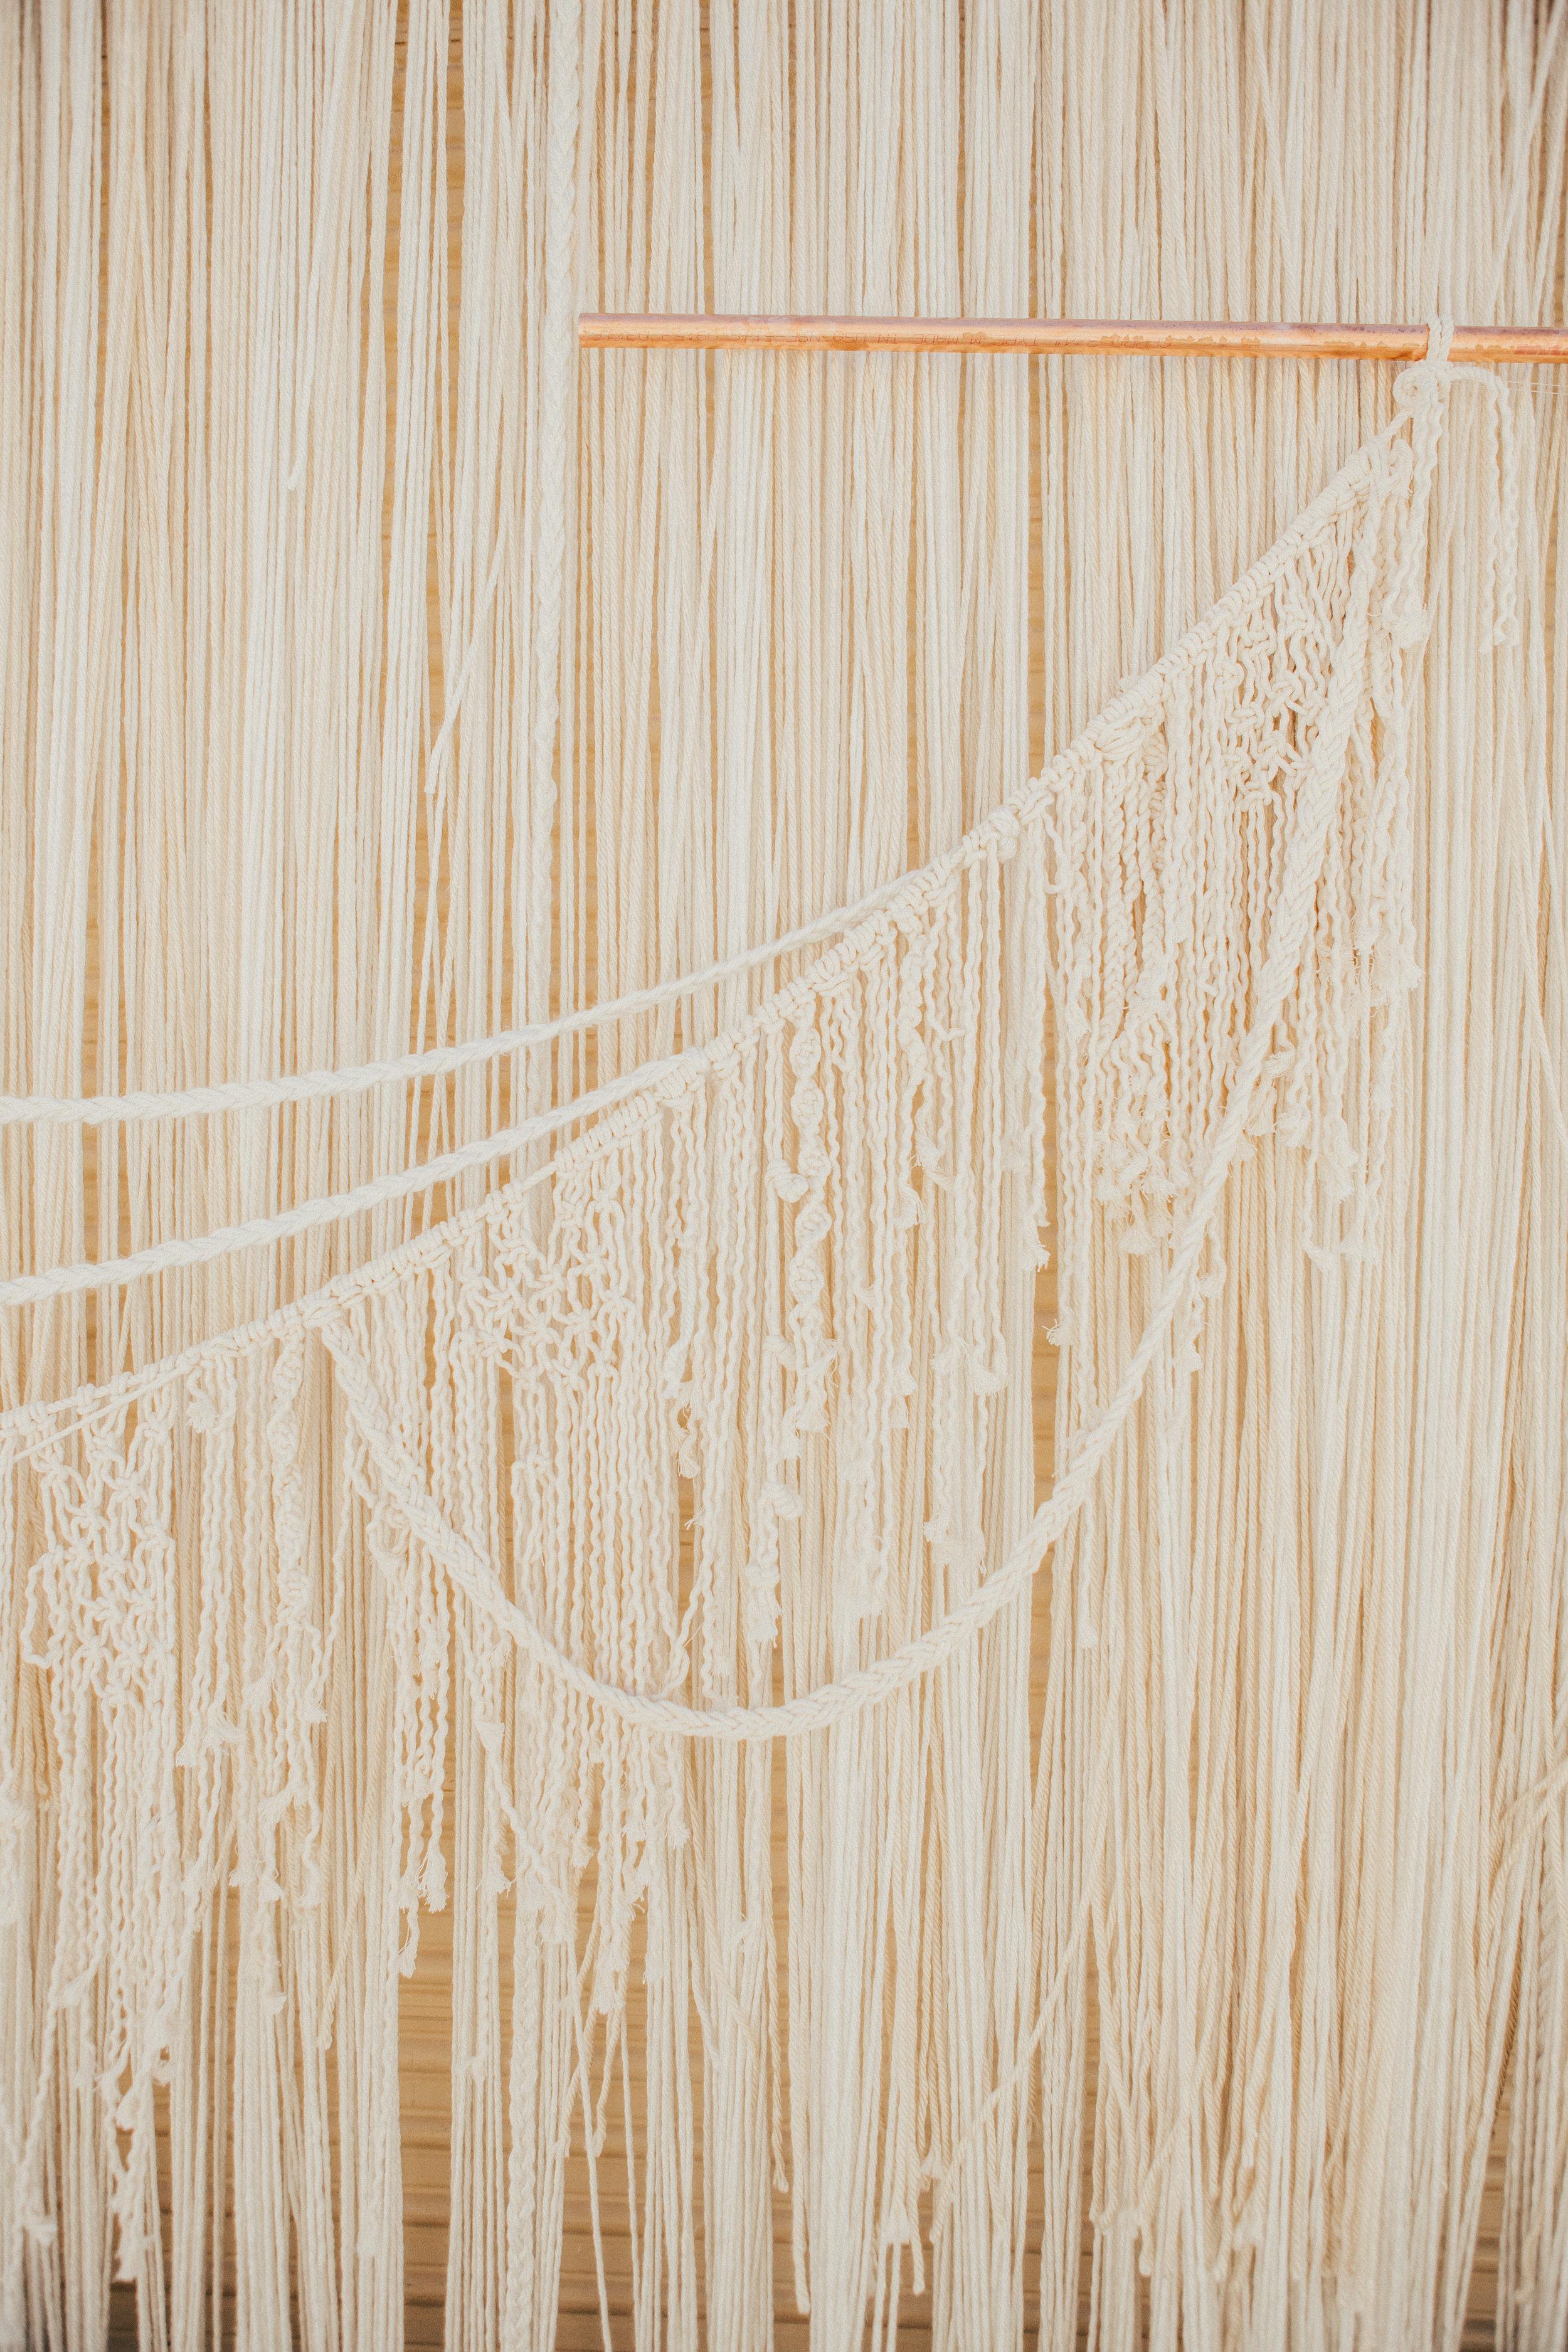 Joshua Tree Wedding Macrame | Relevant + Raw Installation | @RelevantRaw